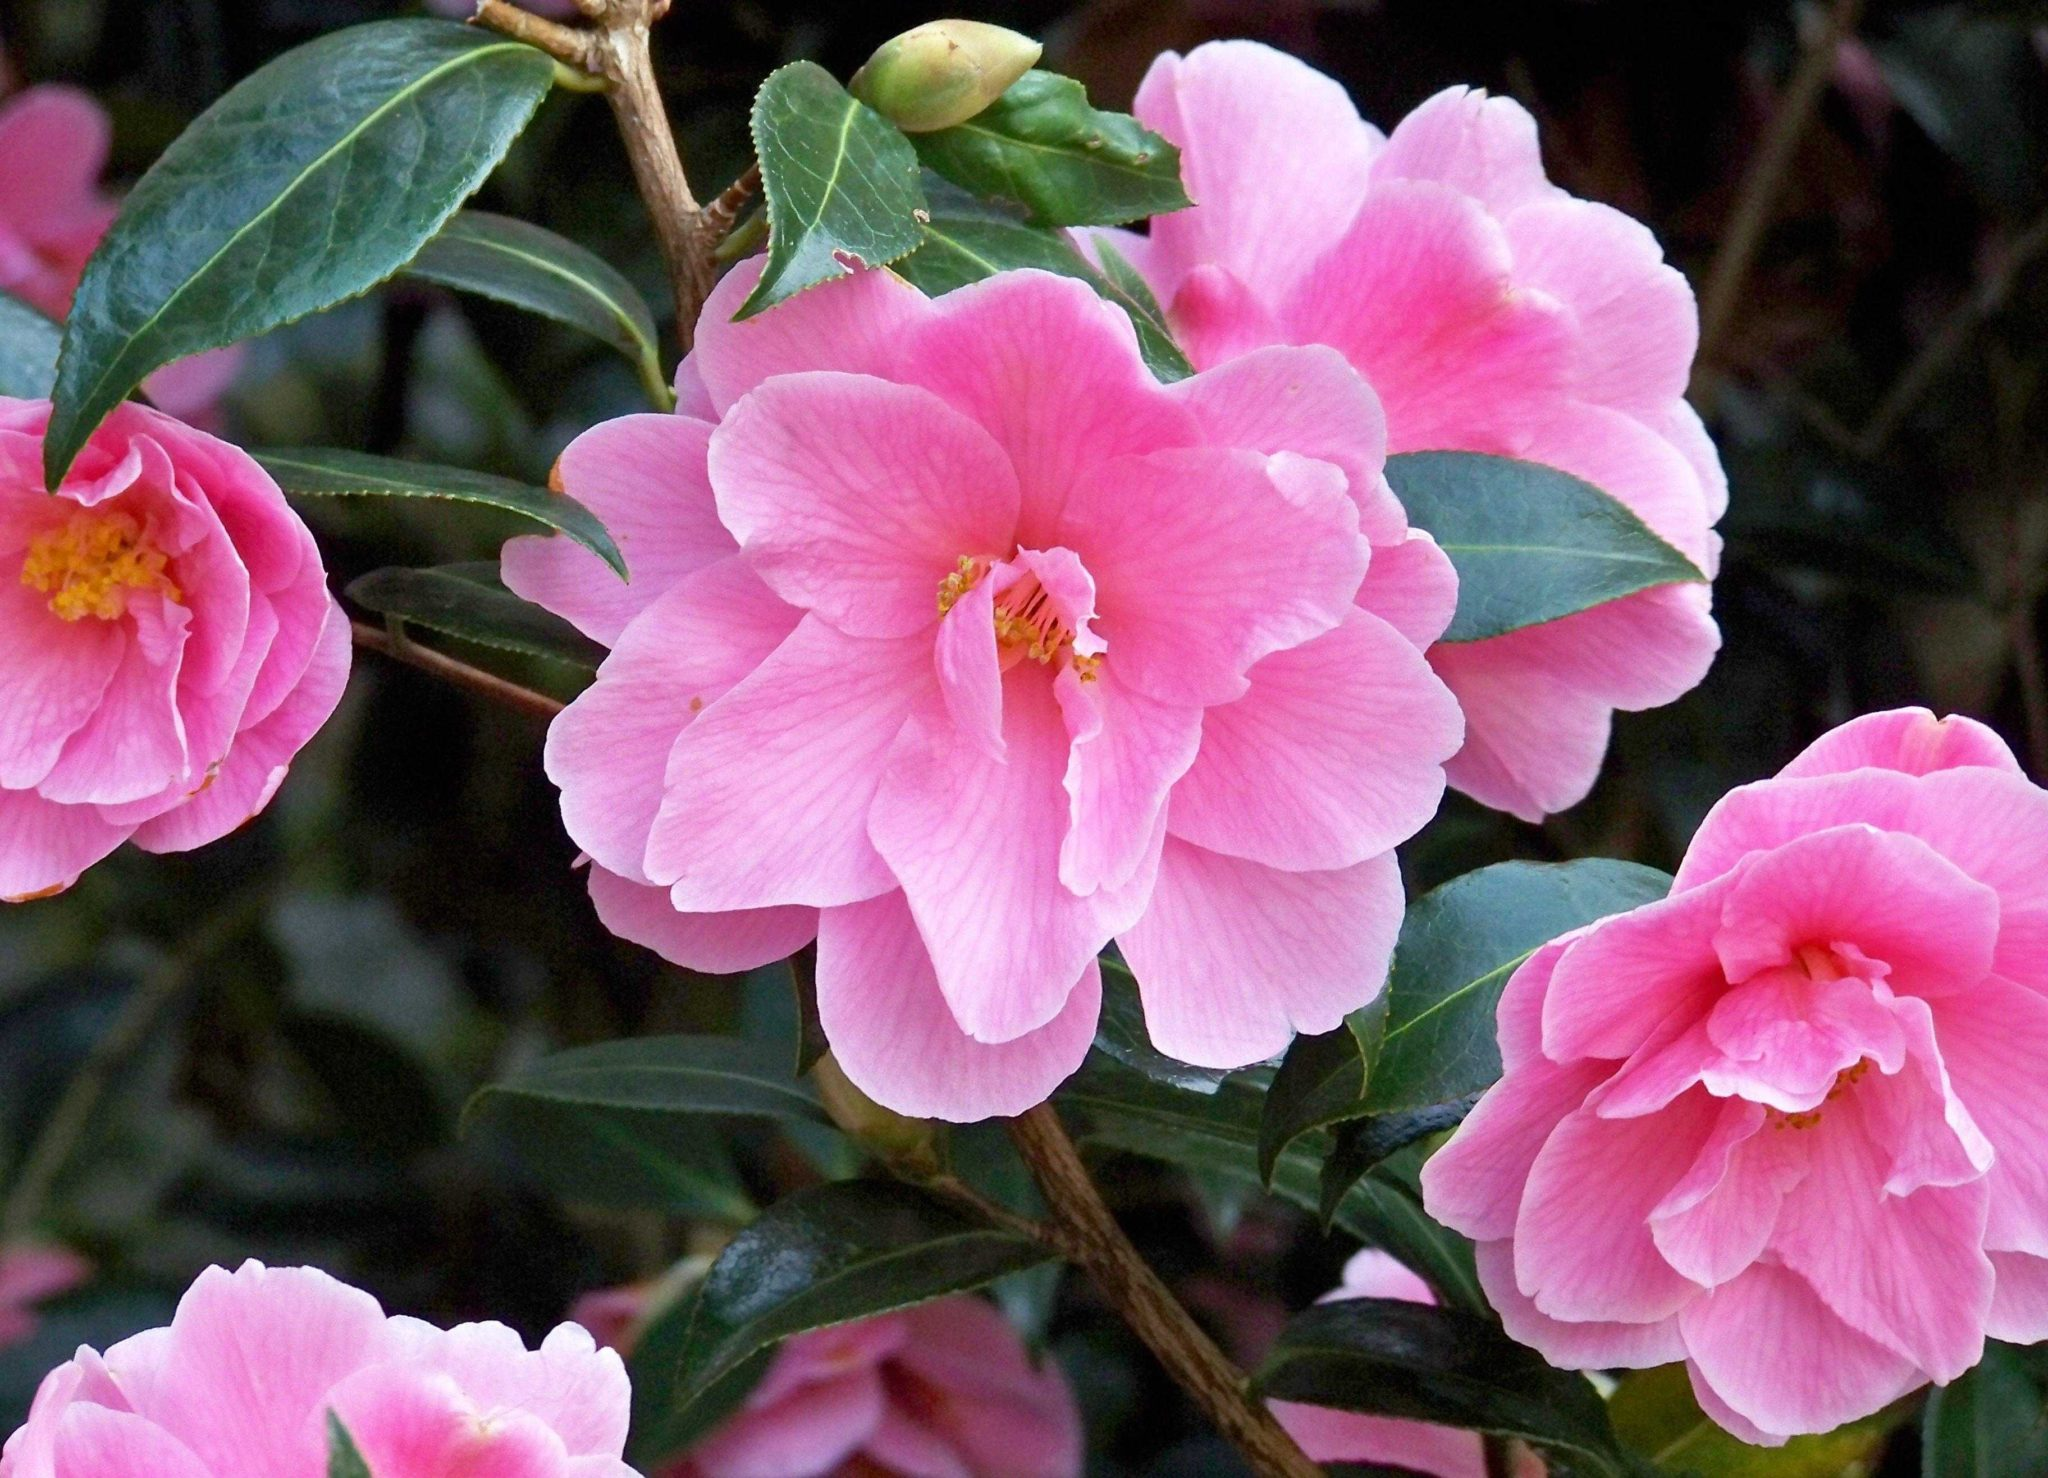 camelia fragrance scent windsor london chiswick